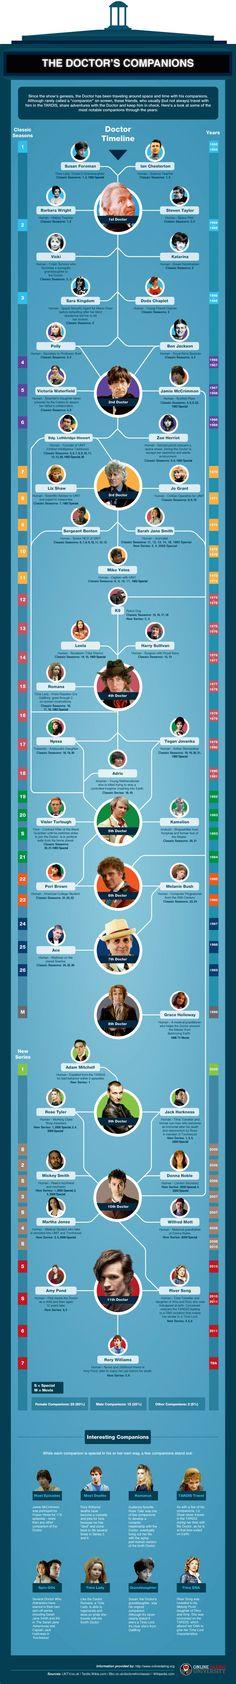 doctor-who-companion-infographic.jpg (800×5709)